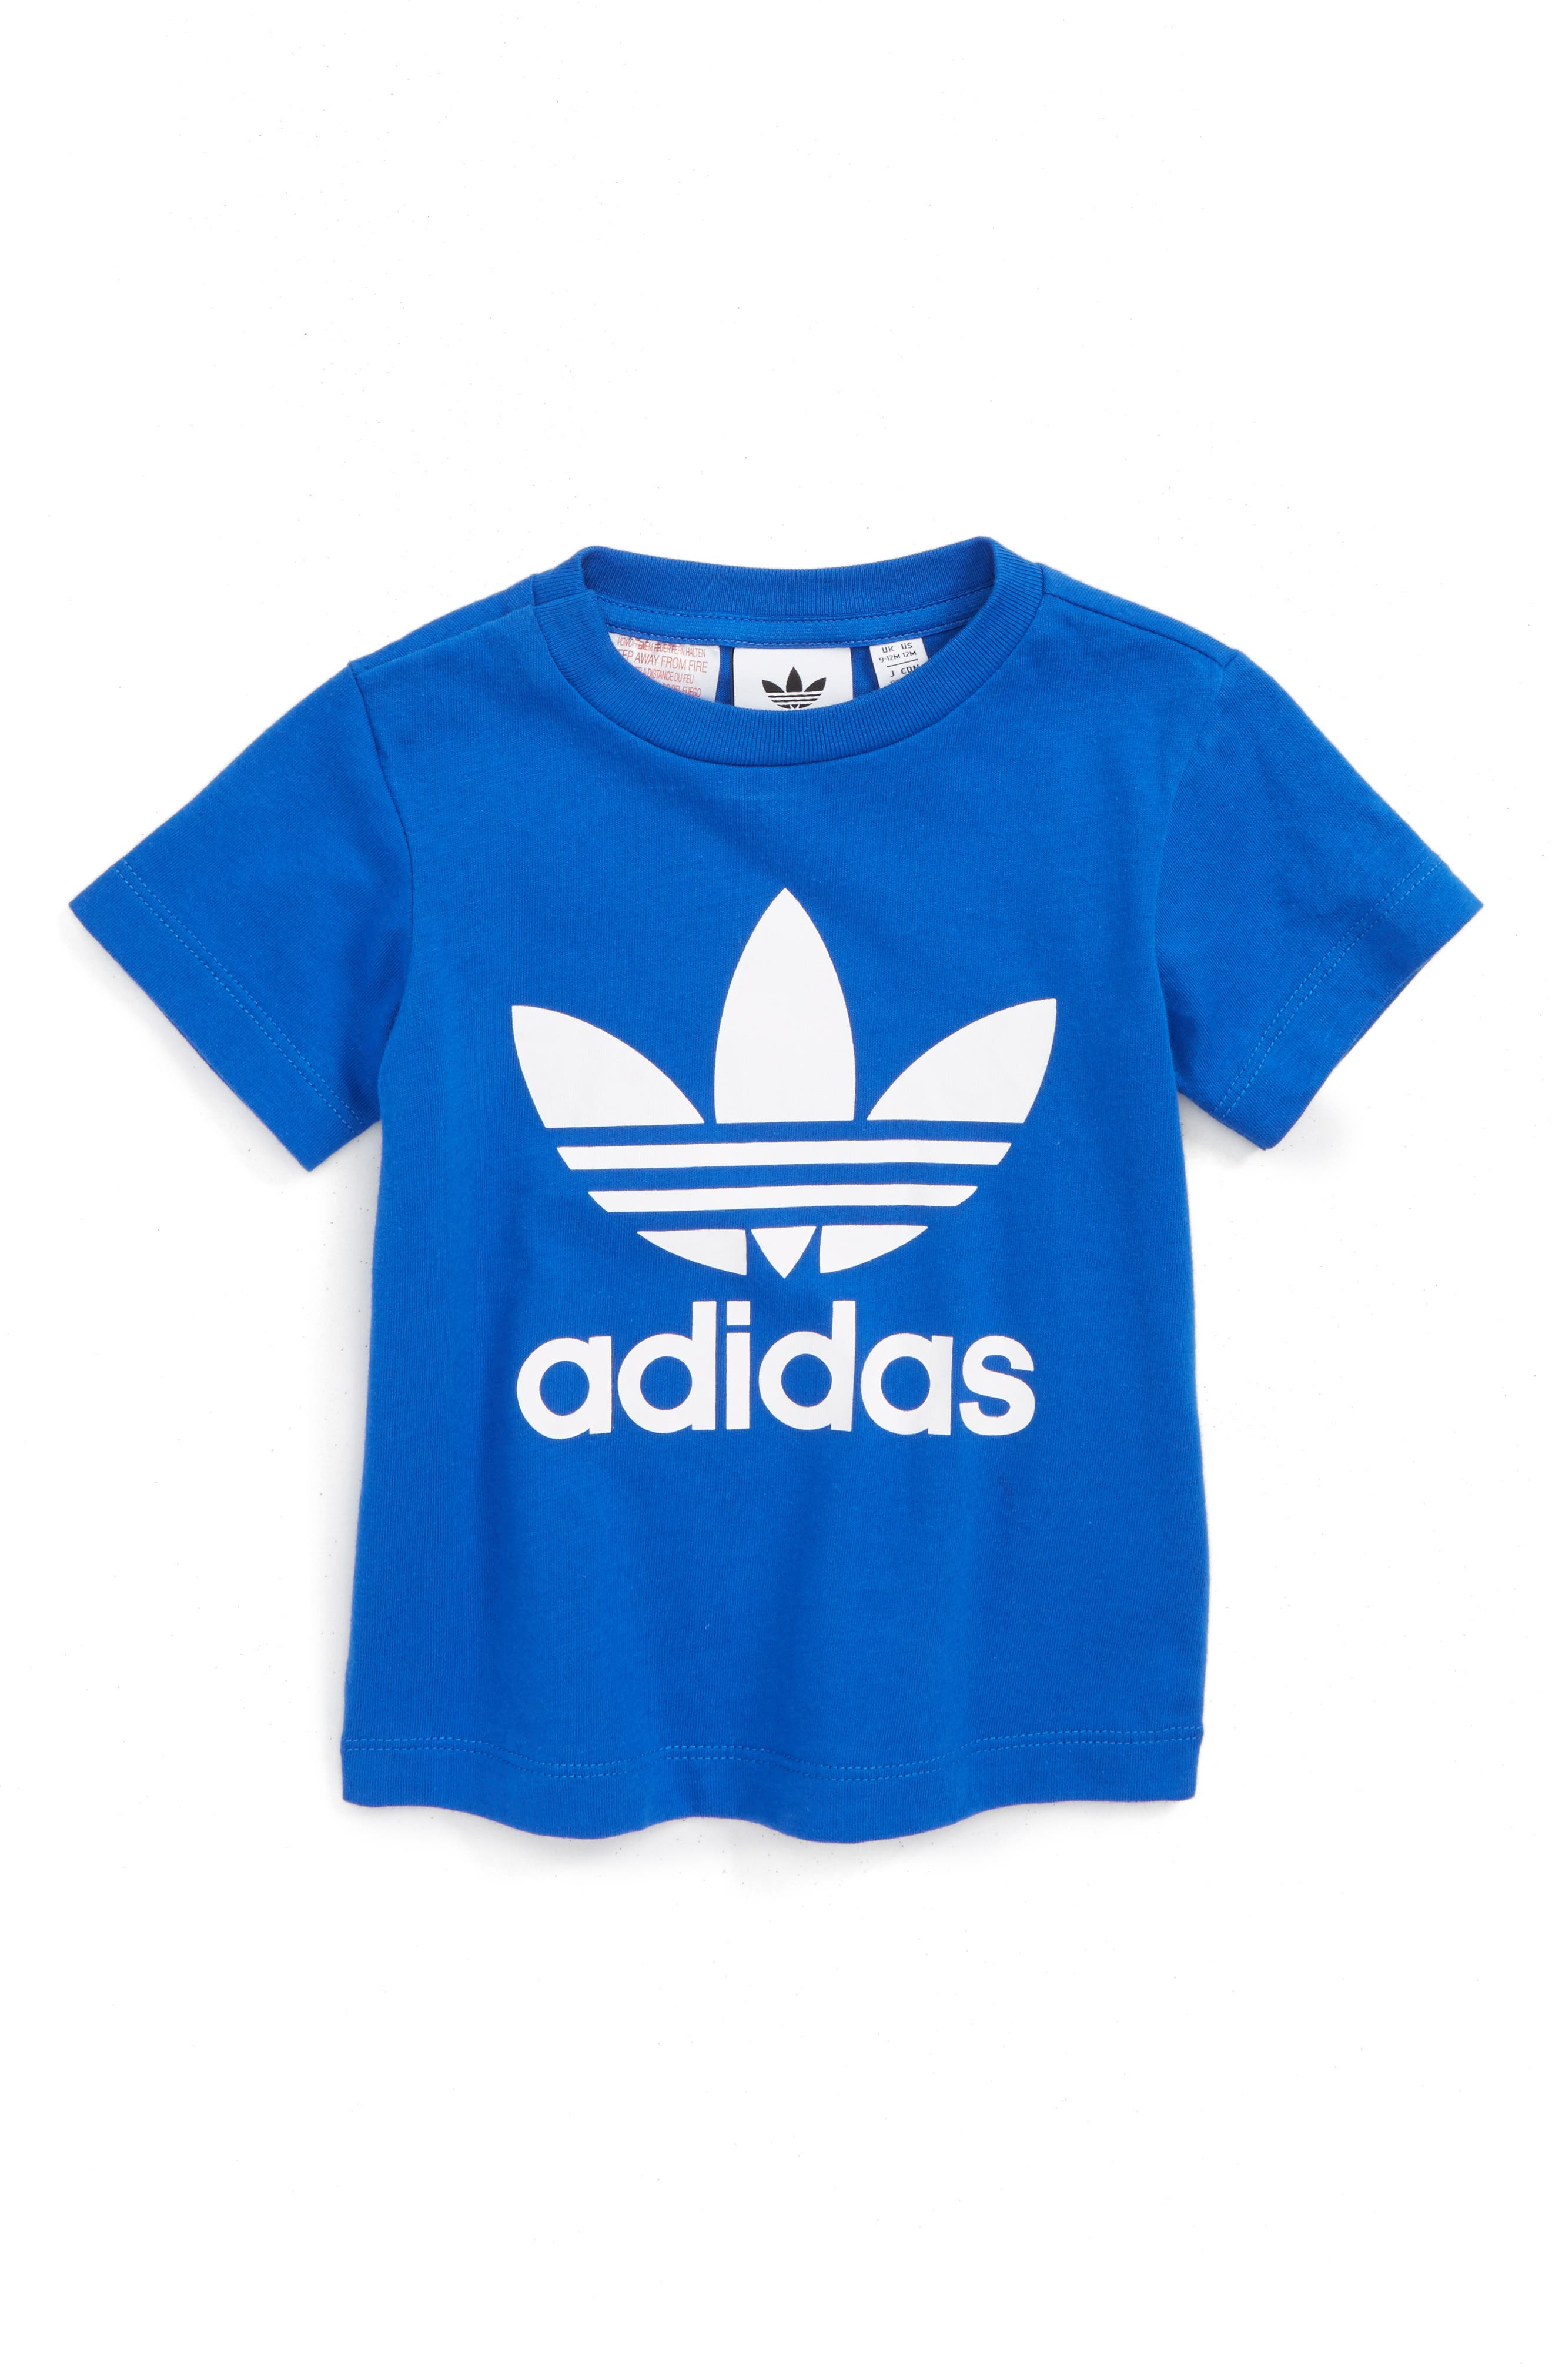 adidas t shirt baby